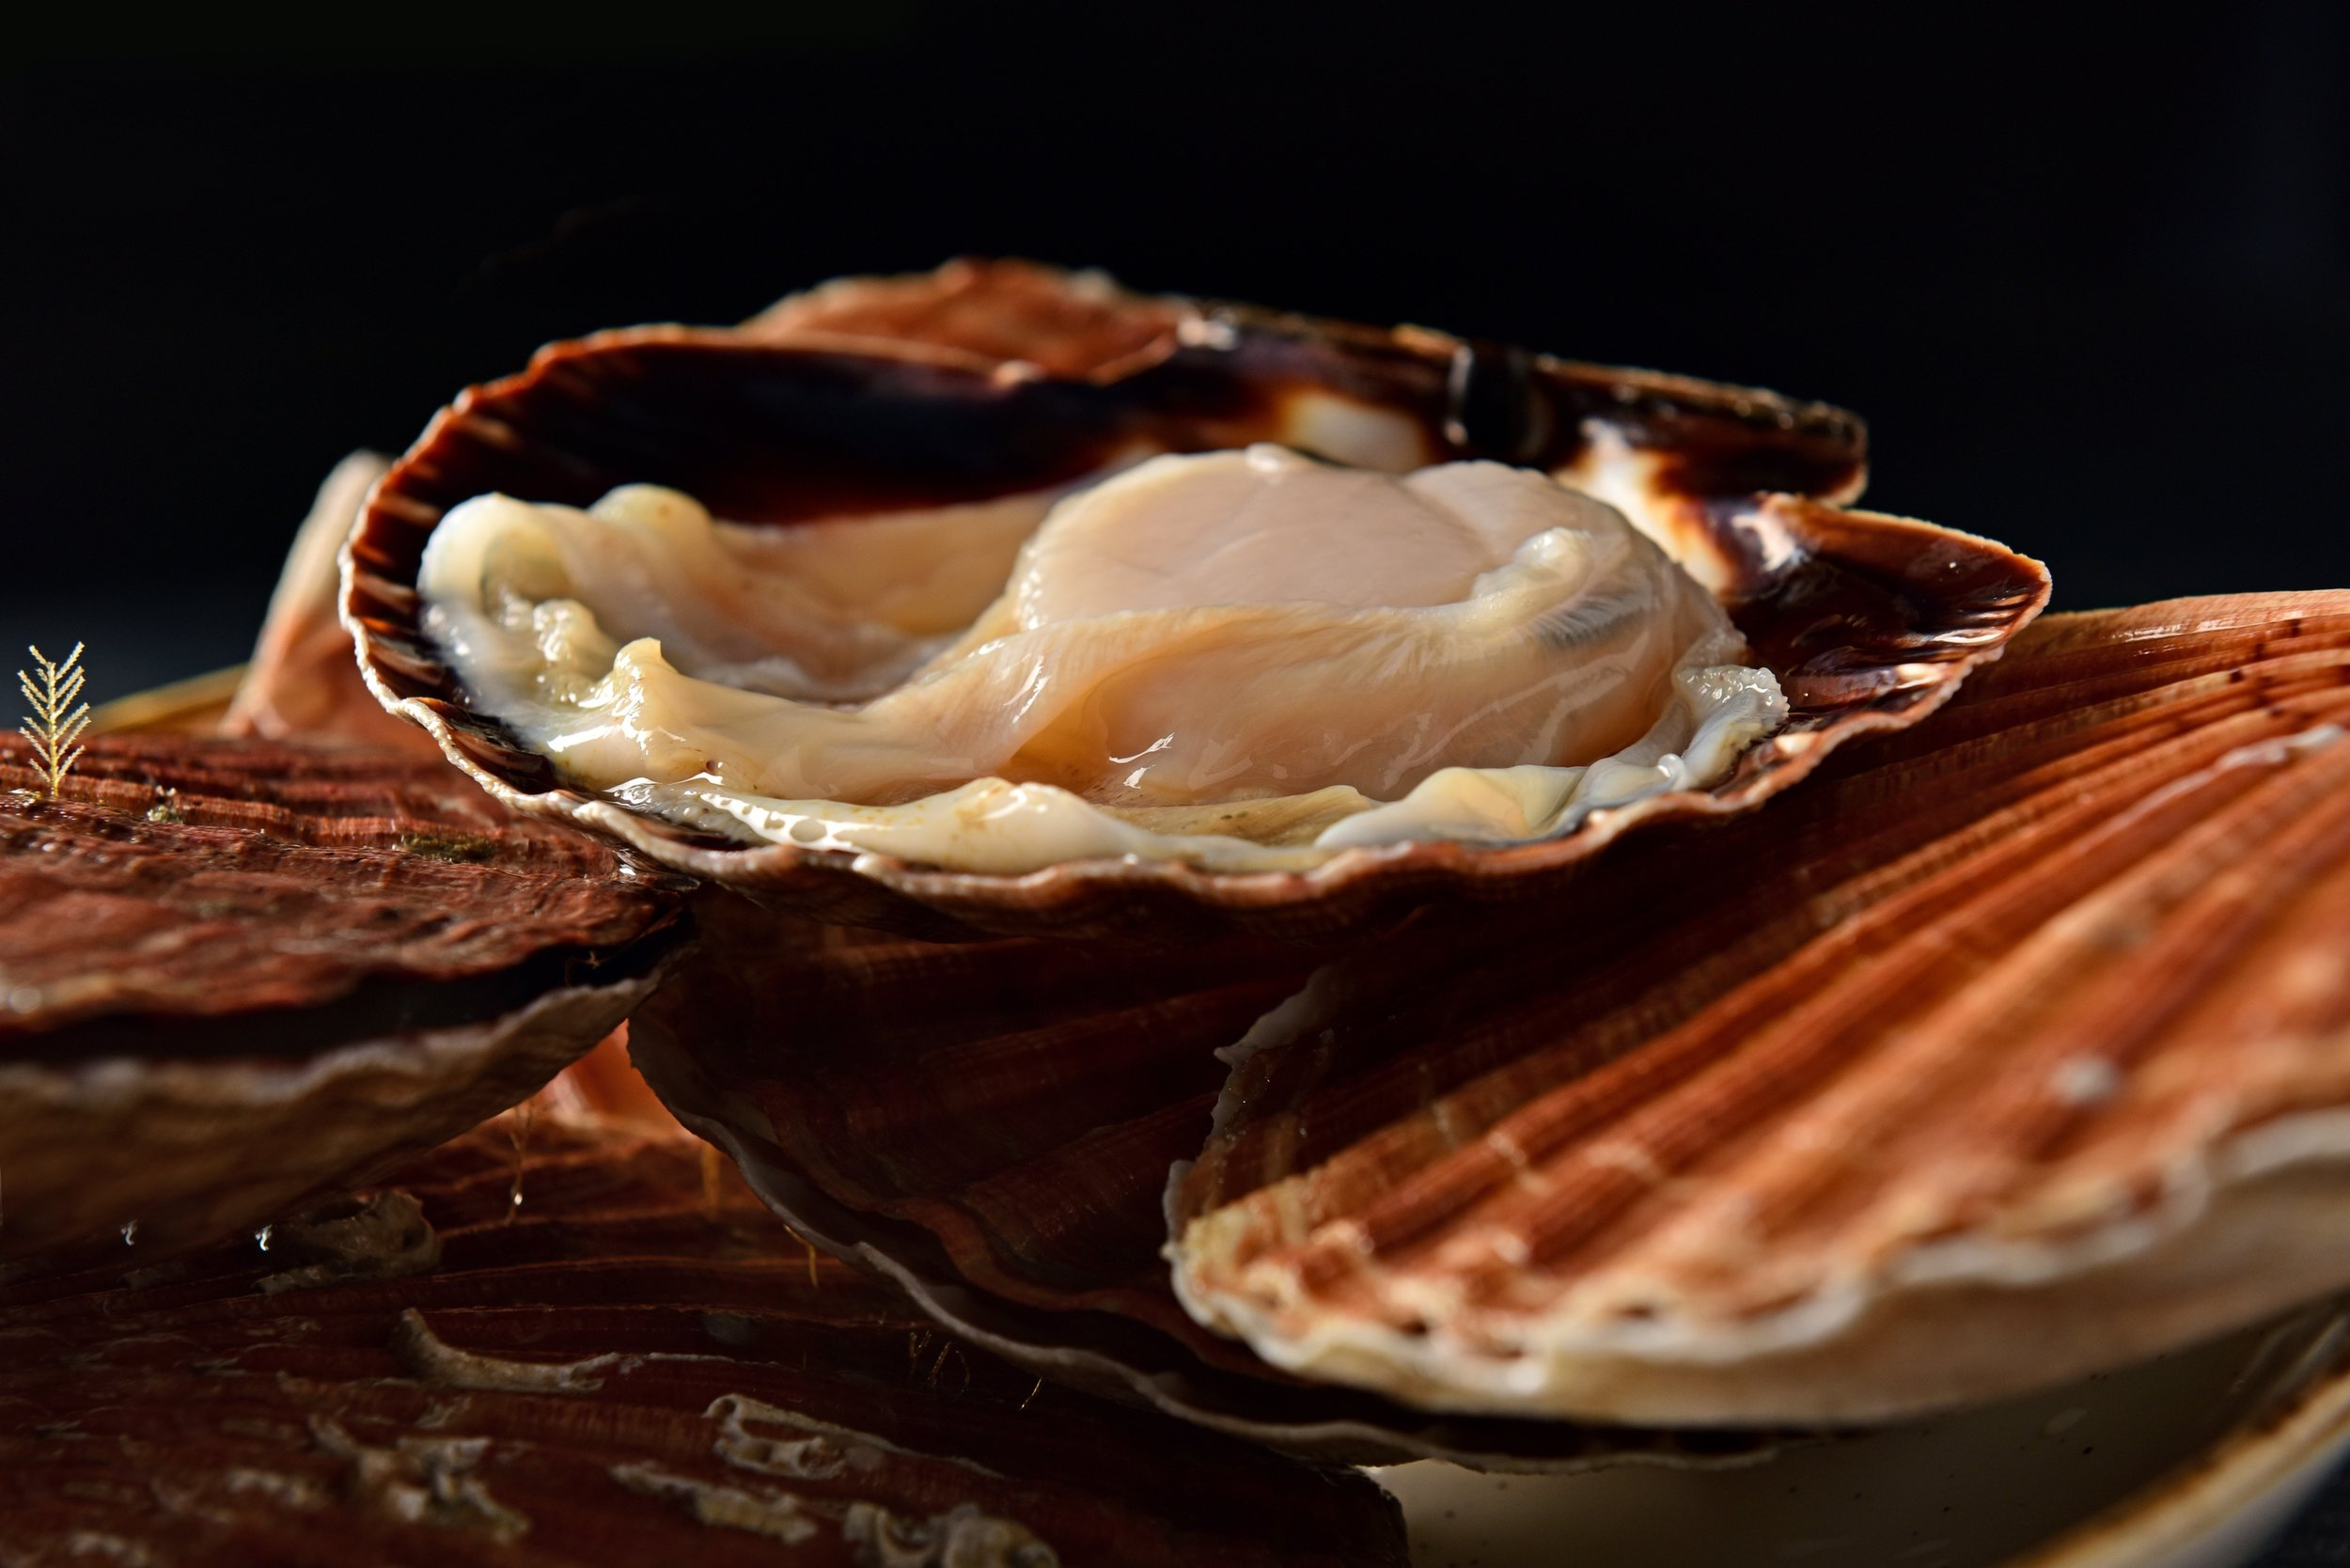 18 brasserie juste restaurant Dikkelvenne tablefever bart albrecht culinair fotograaf foodfotograaf.jpg